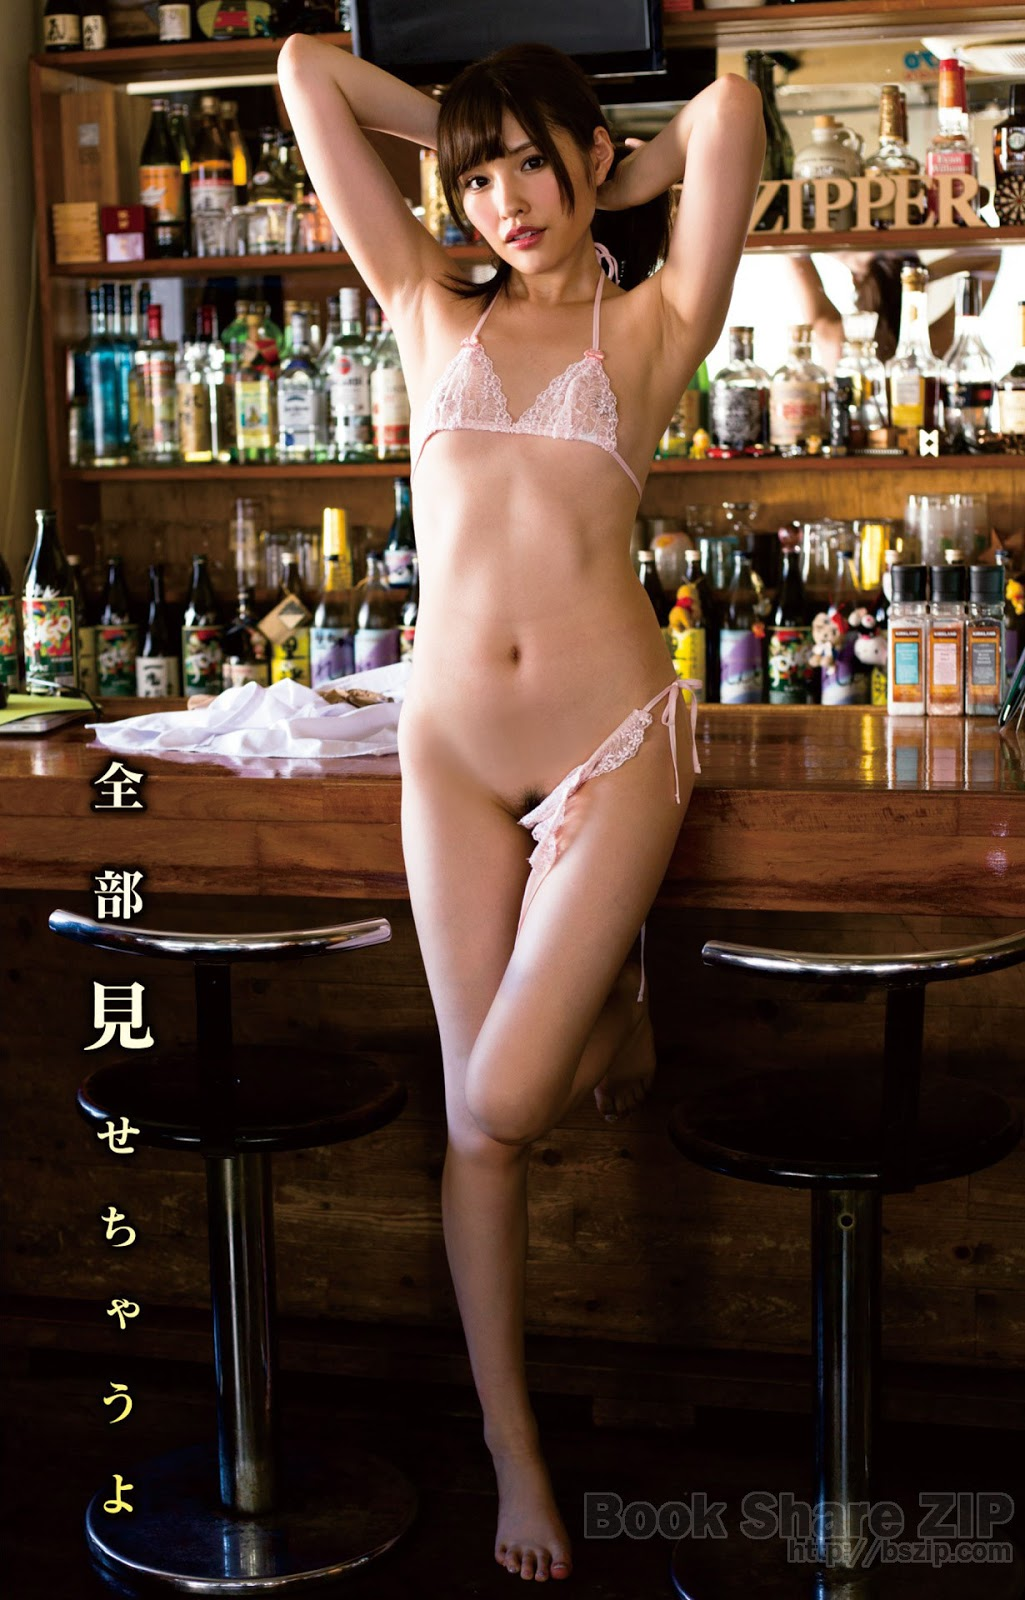 Arina Hashimoto 橋本ありな, Shukan Jitsuwa 2017.10.26 (週刊実話 2017年10月26日号)